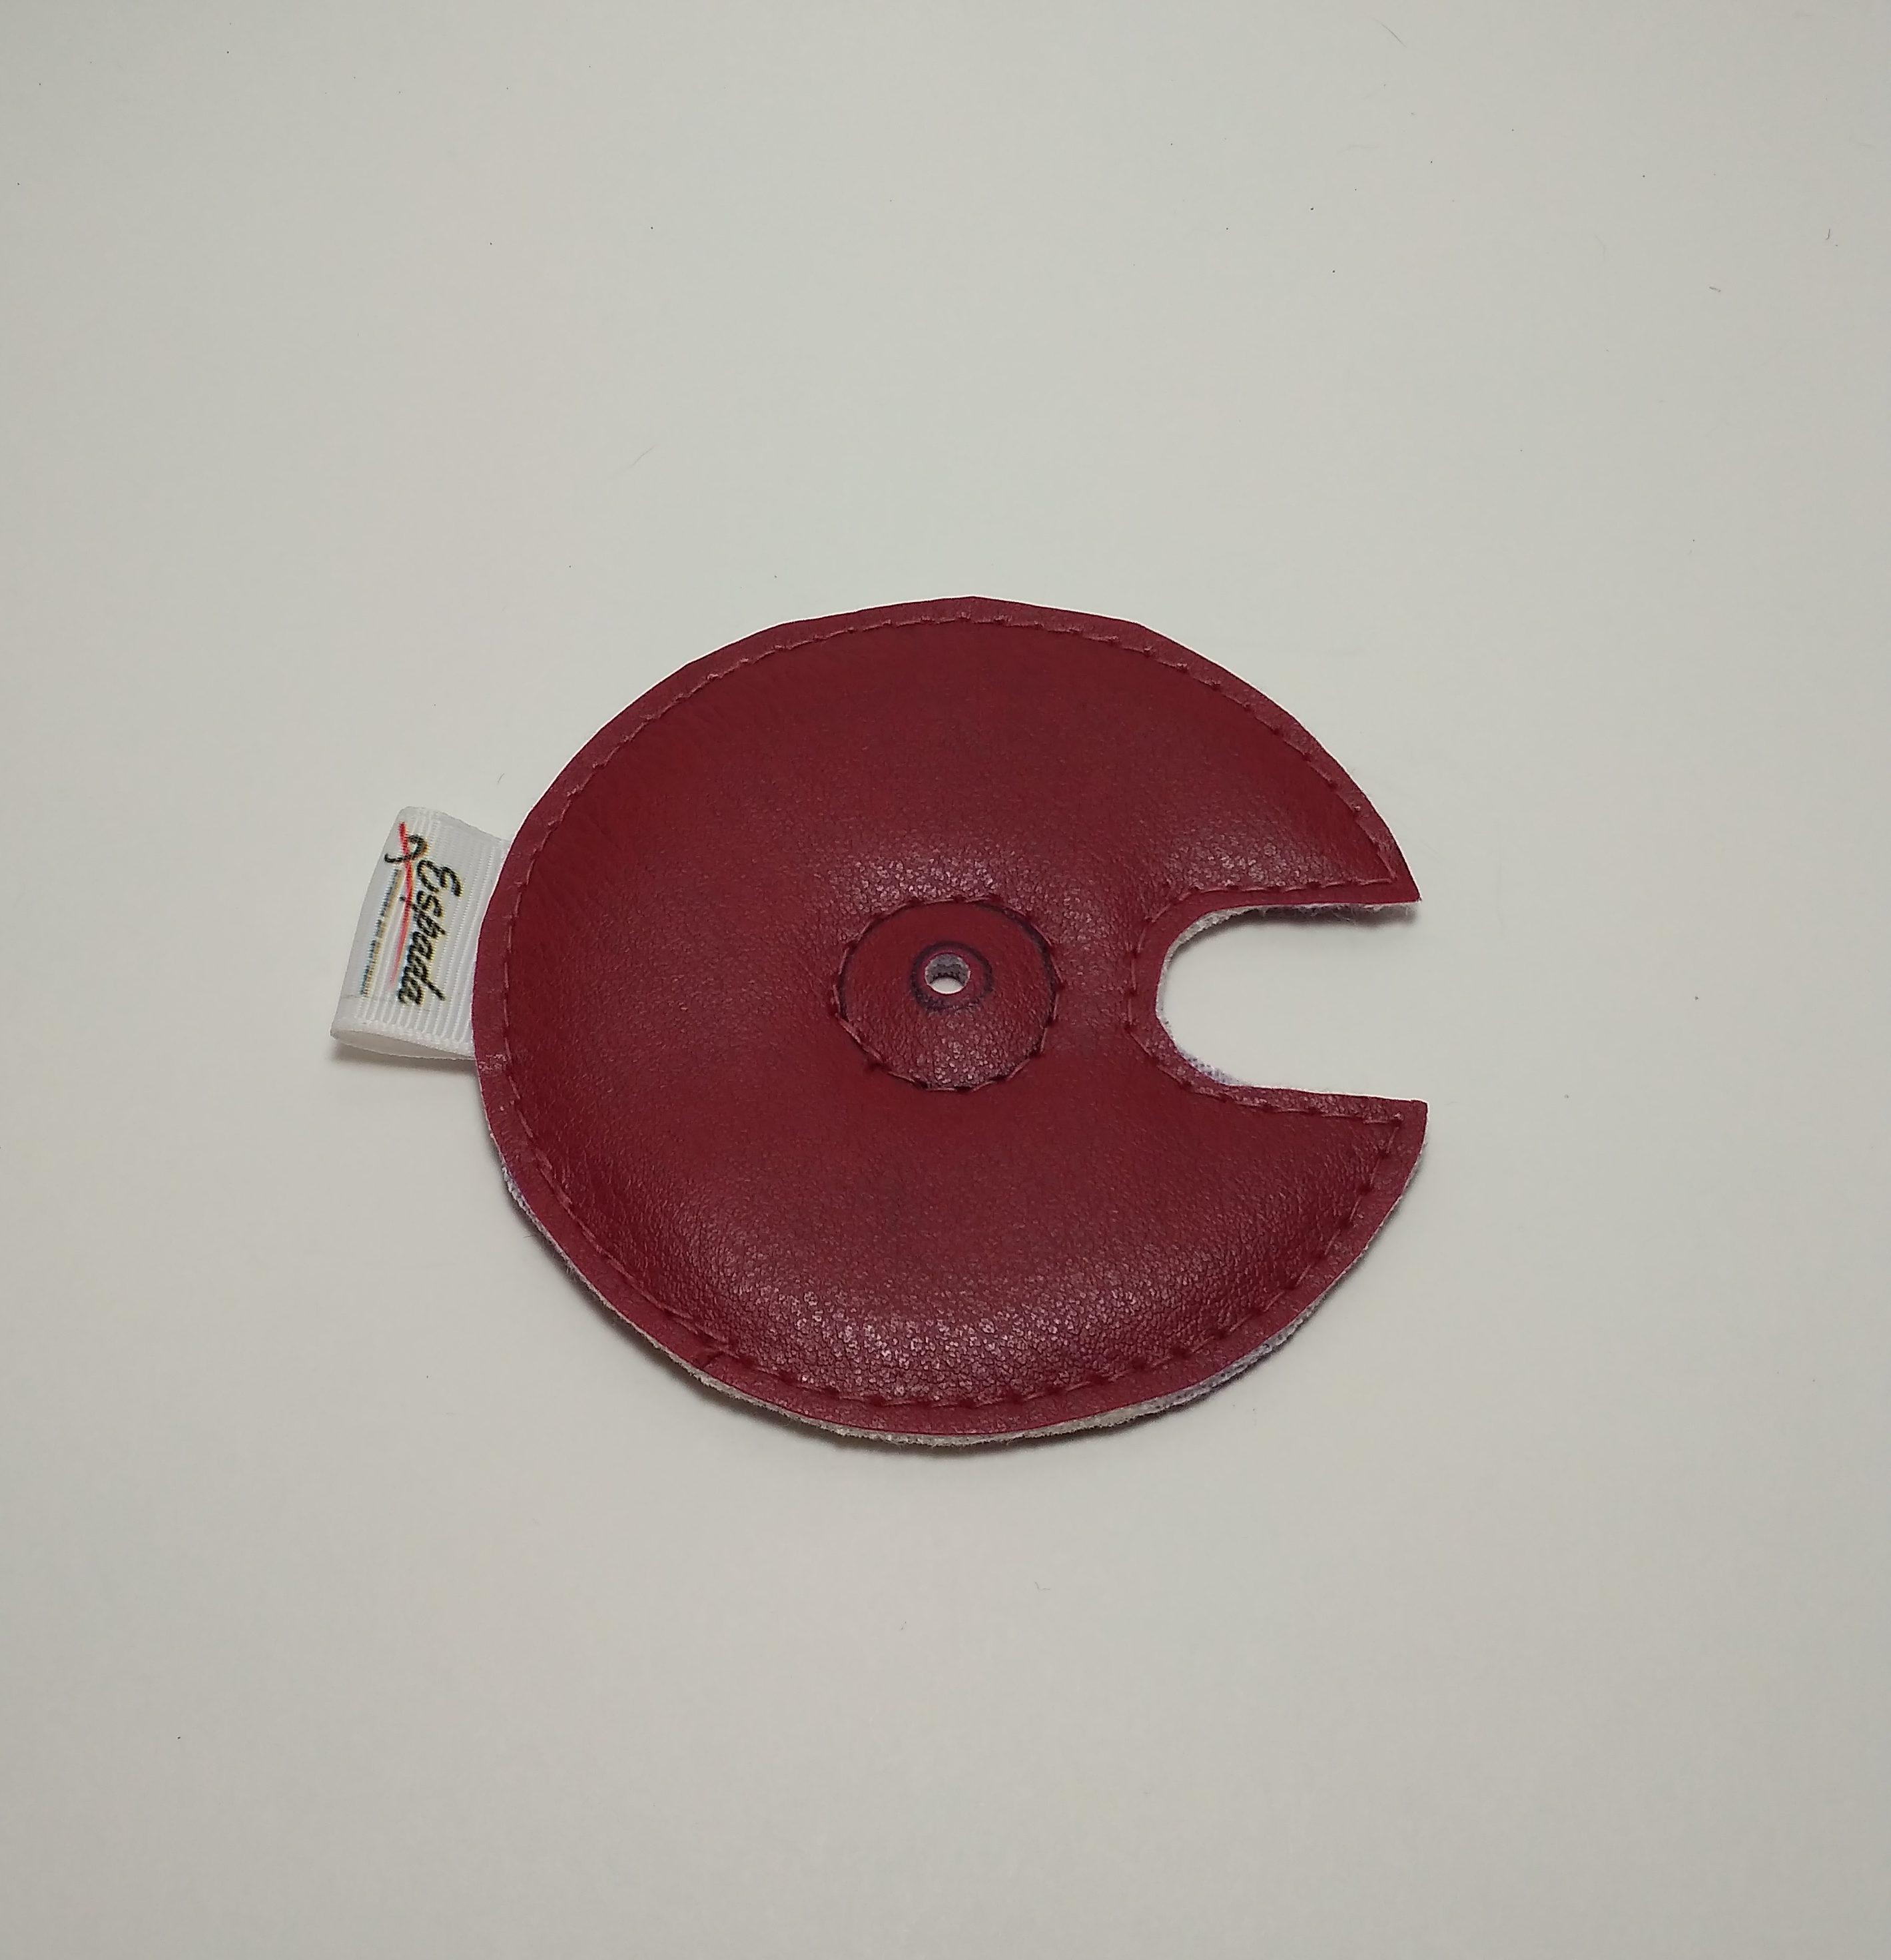 Прокладка рапирасабля (эко кожа)_Espada-12